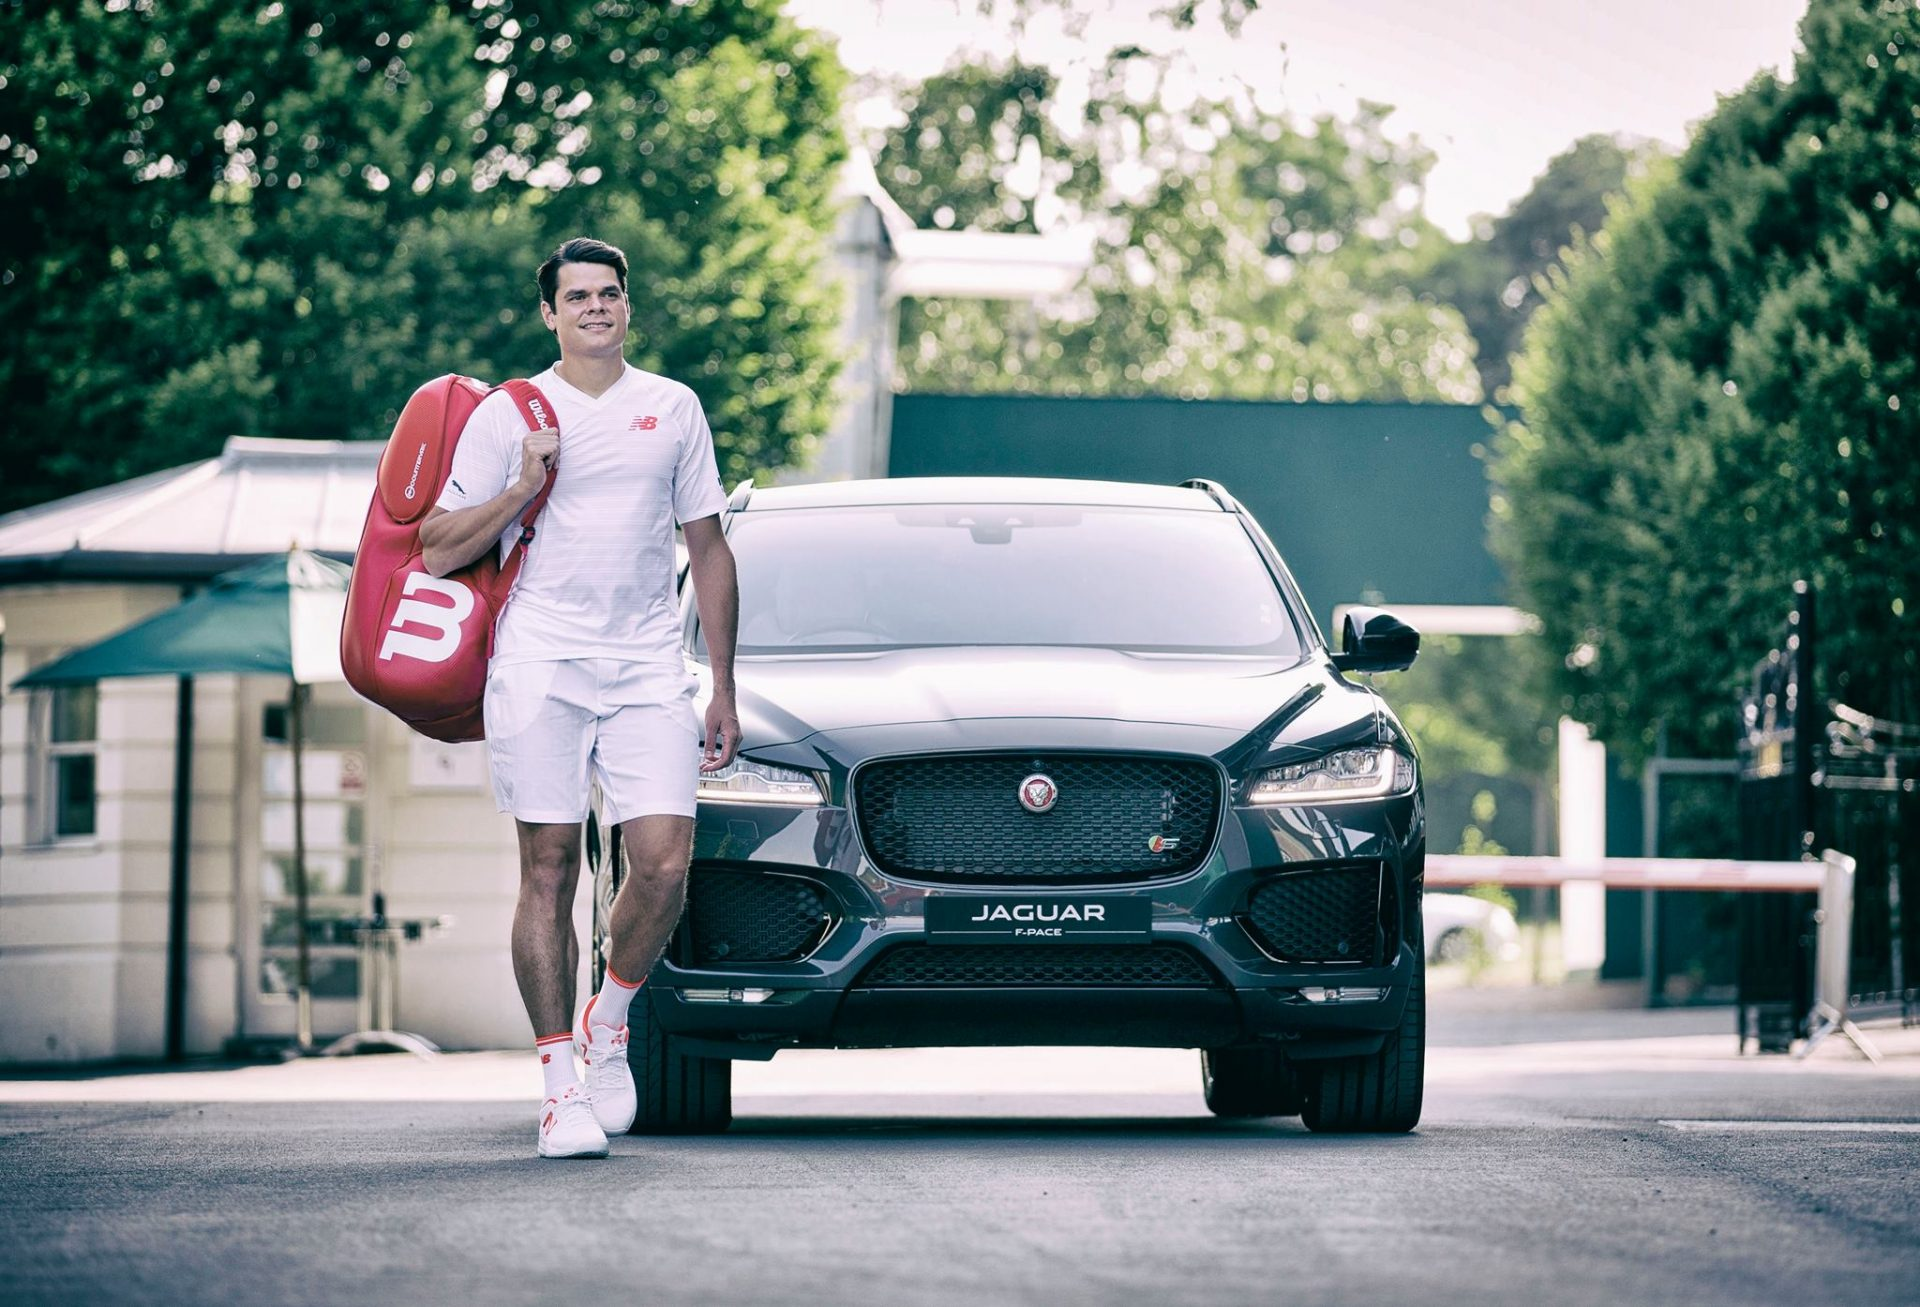 Milos Raonic Brand Ambassador Sponsor Partner Advertising Marketing Sponsorship Endorsements Jaguar